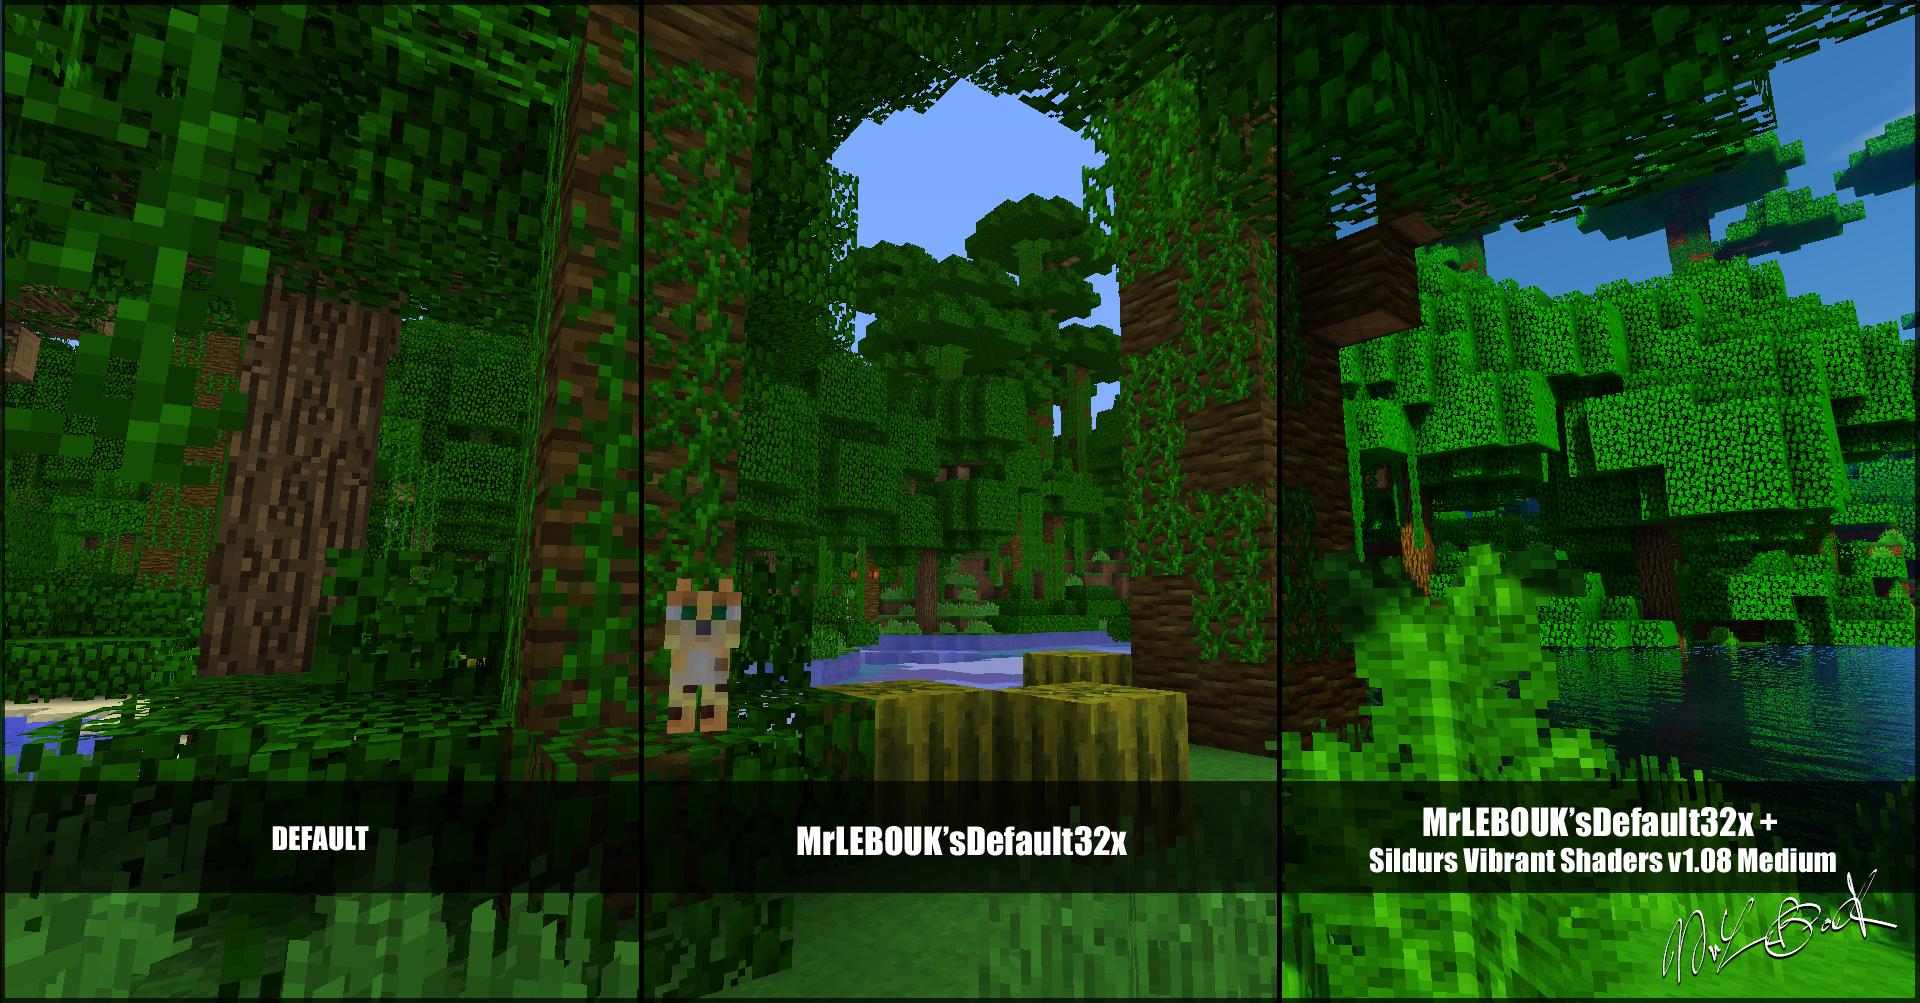 Jungle : Resource pack minecraft MrLEBOUK'SDEFAUT32x